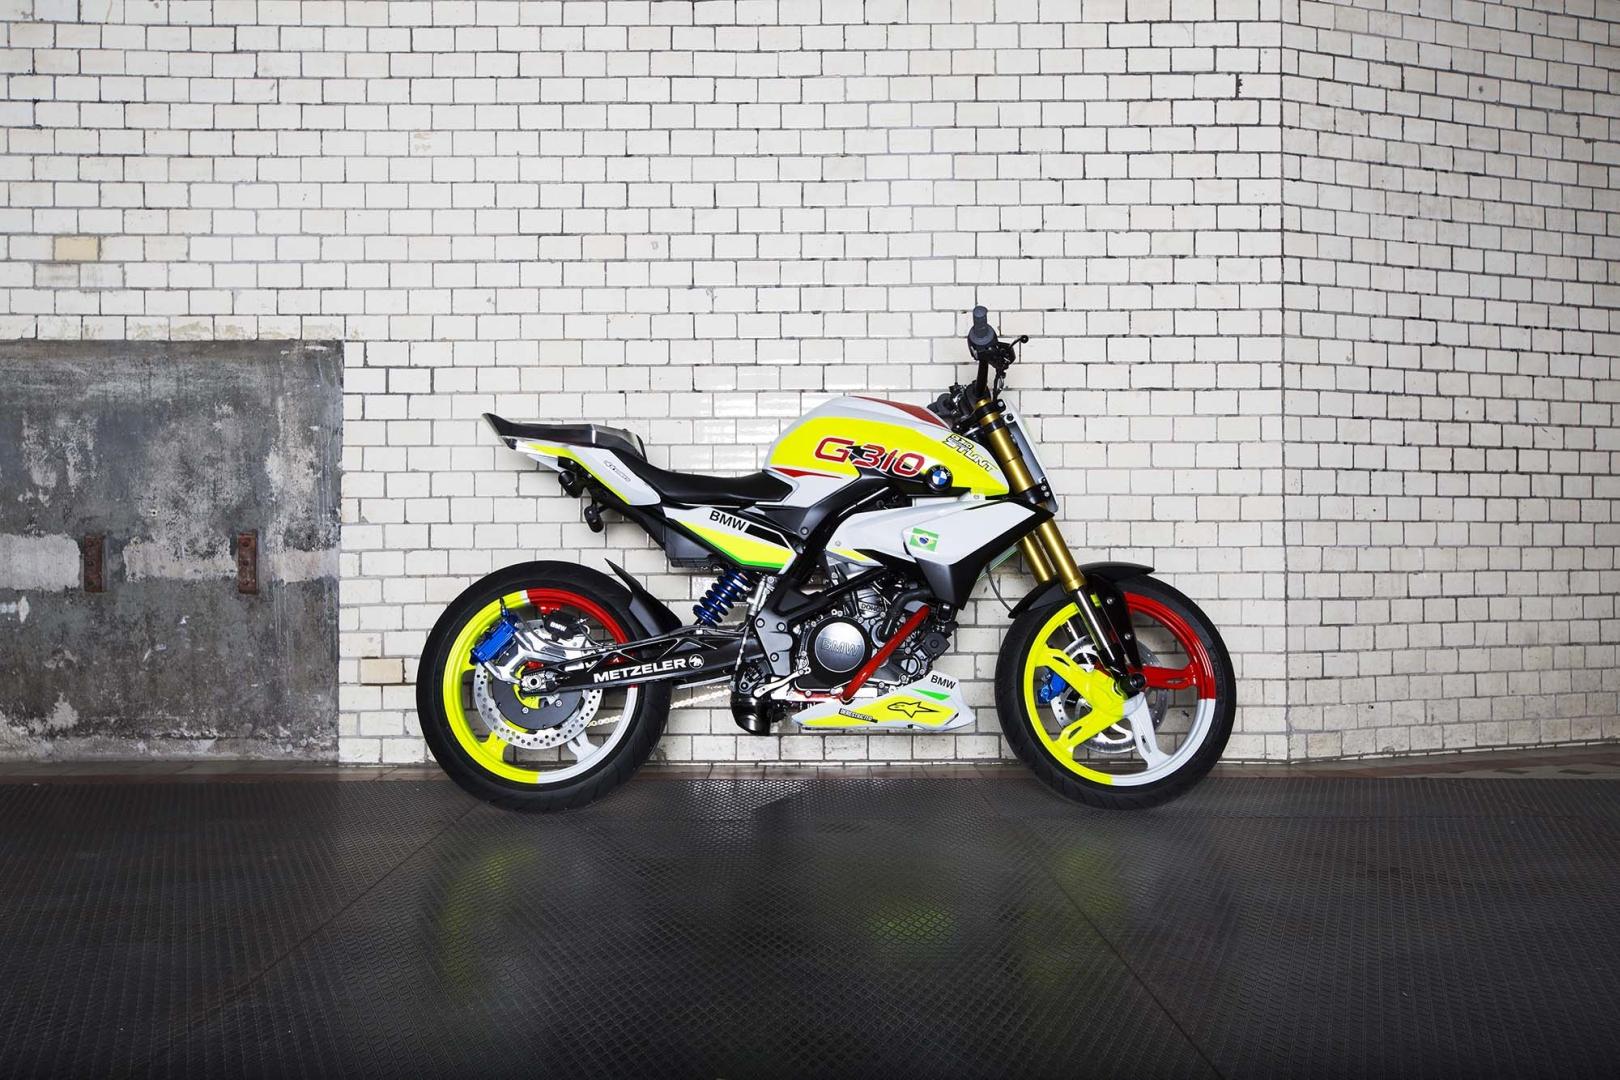 Honda Grom Stunt Bike For Sale Off 62 Www Abrafiltros Org Br